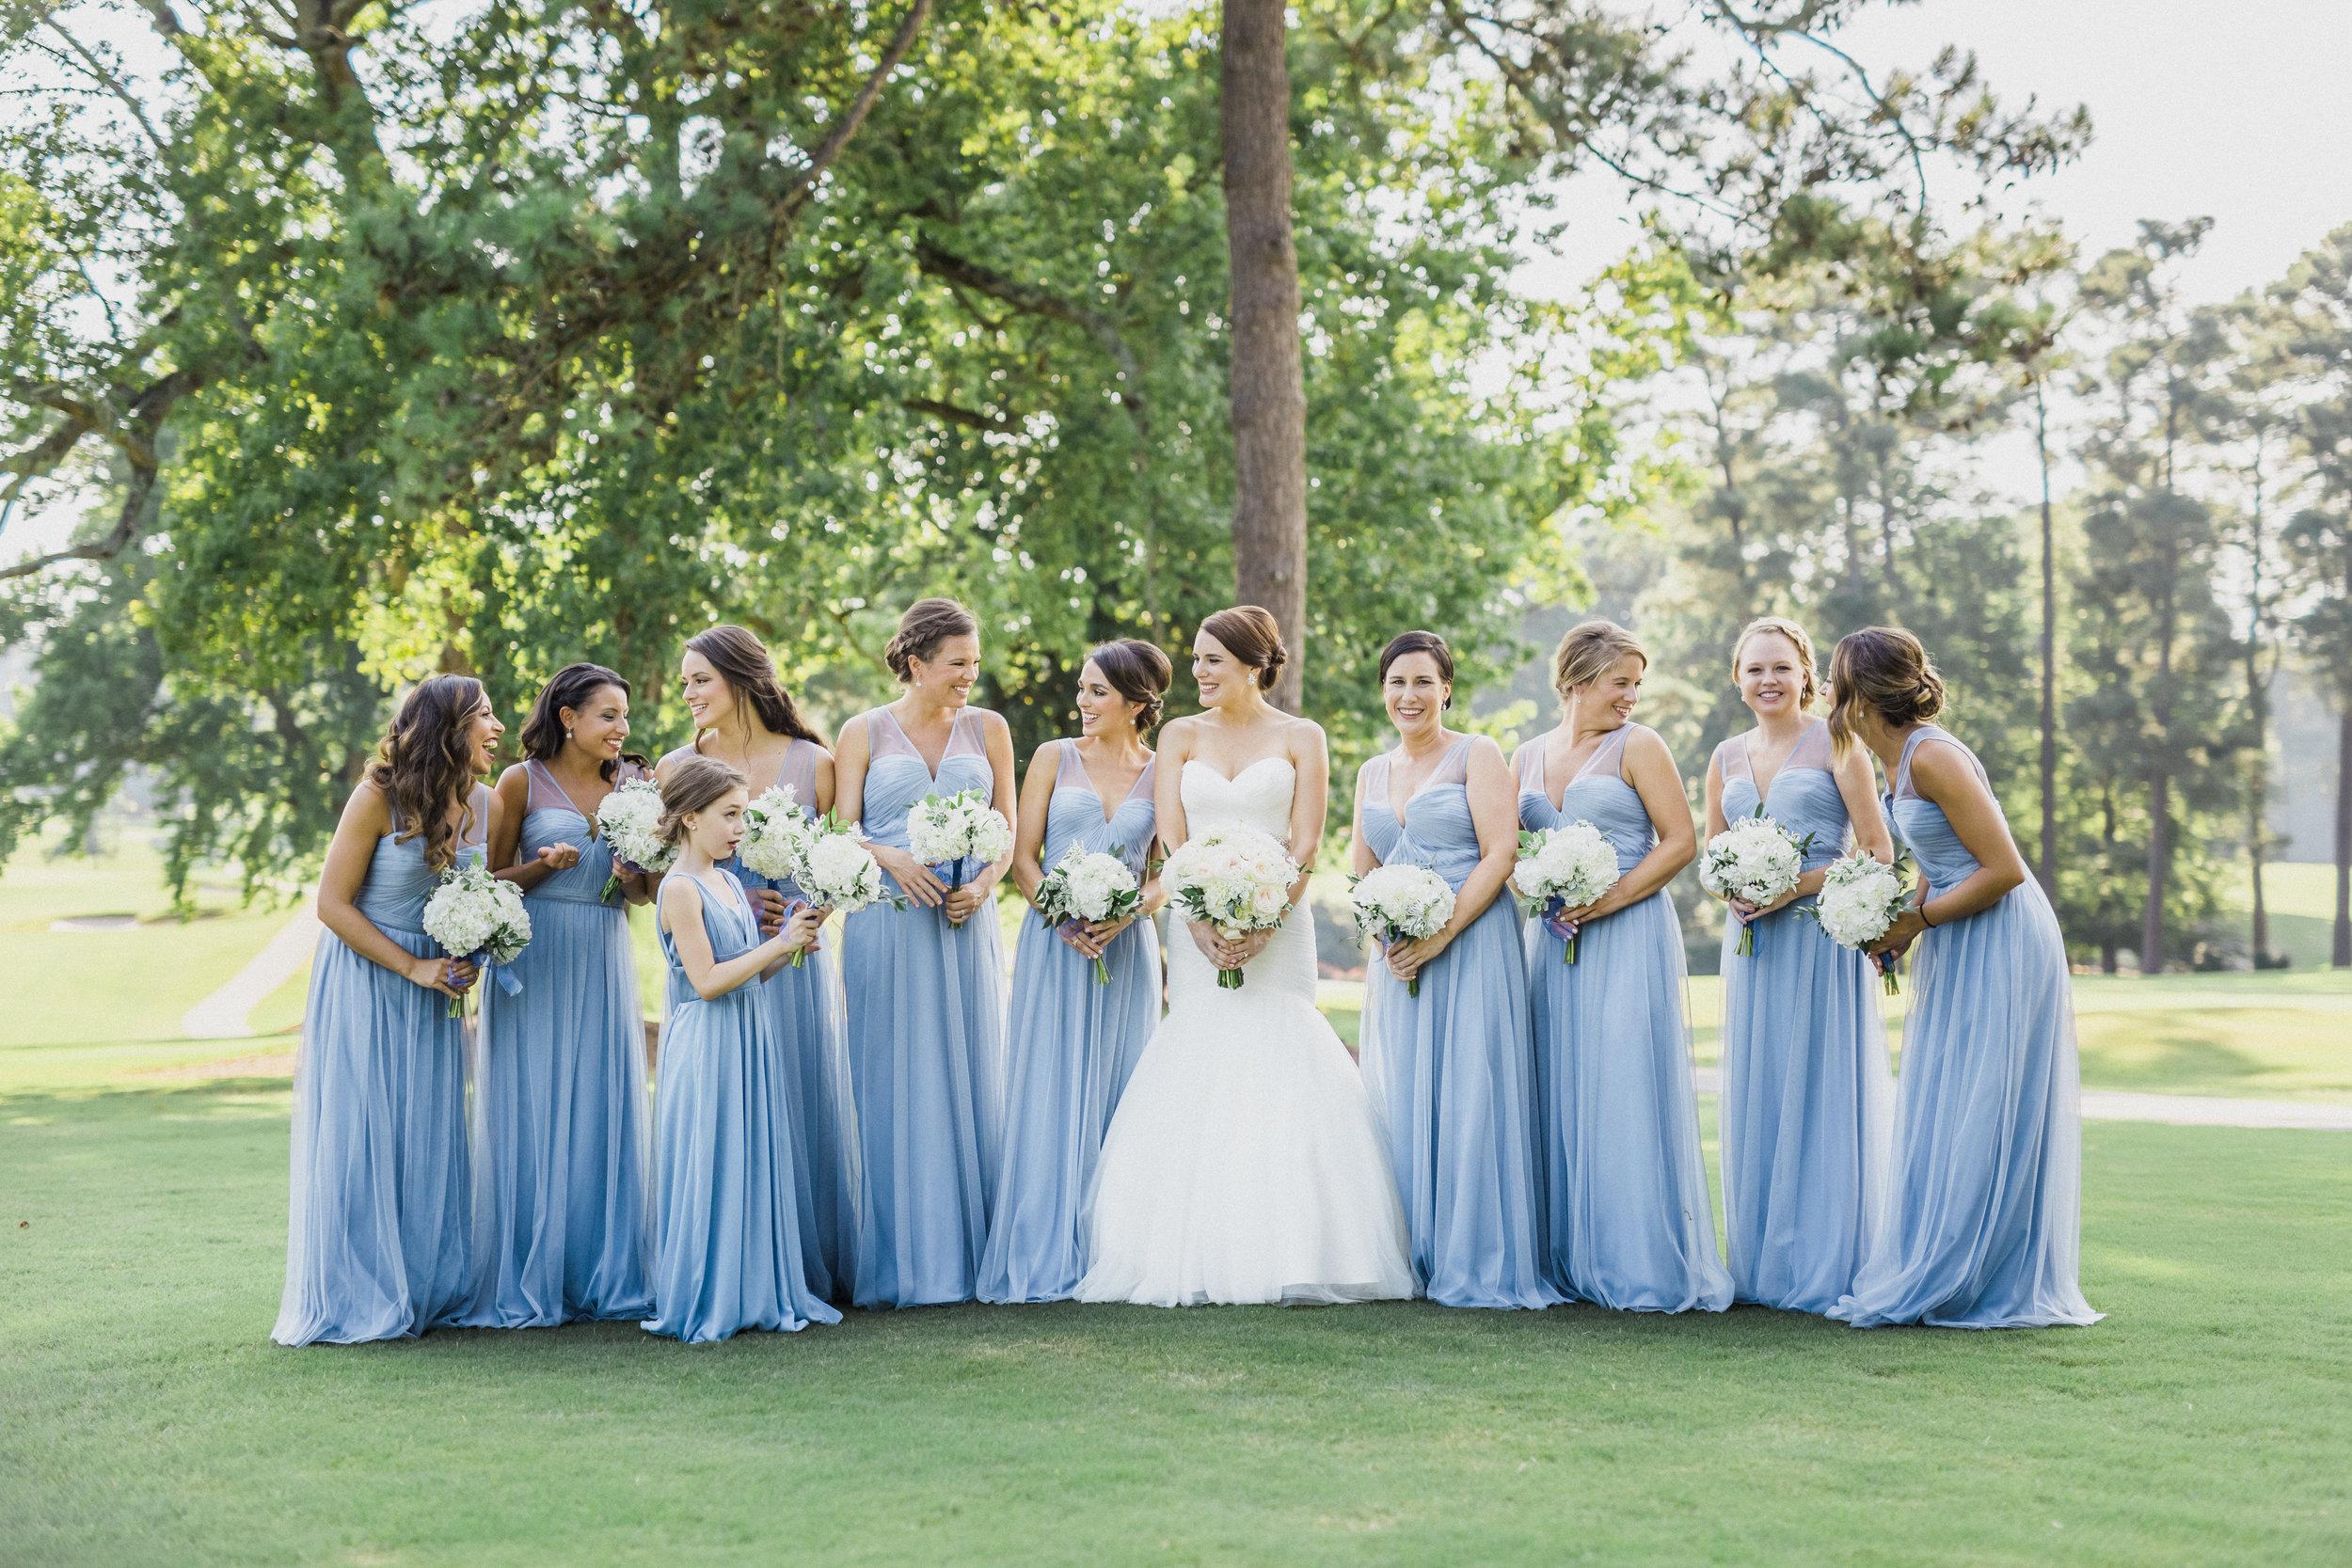 Grantonic-Norment Wedding-304.jpg